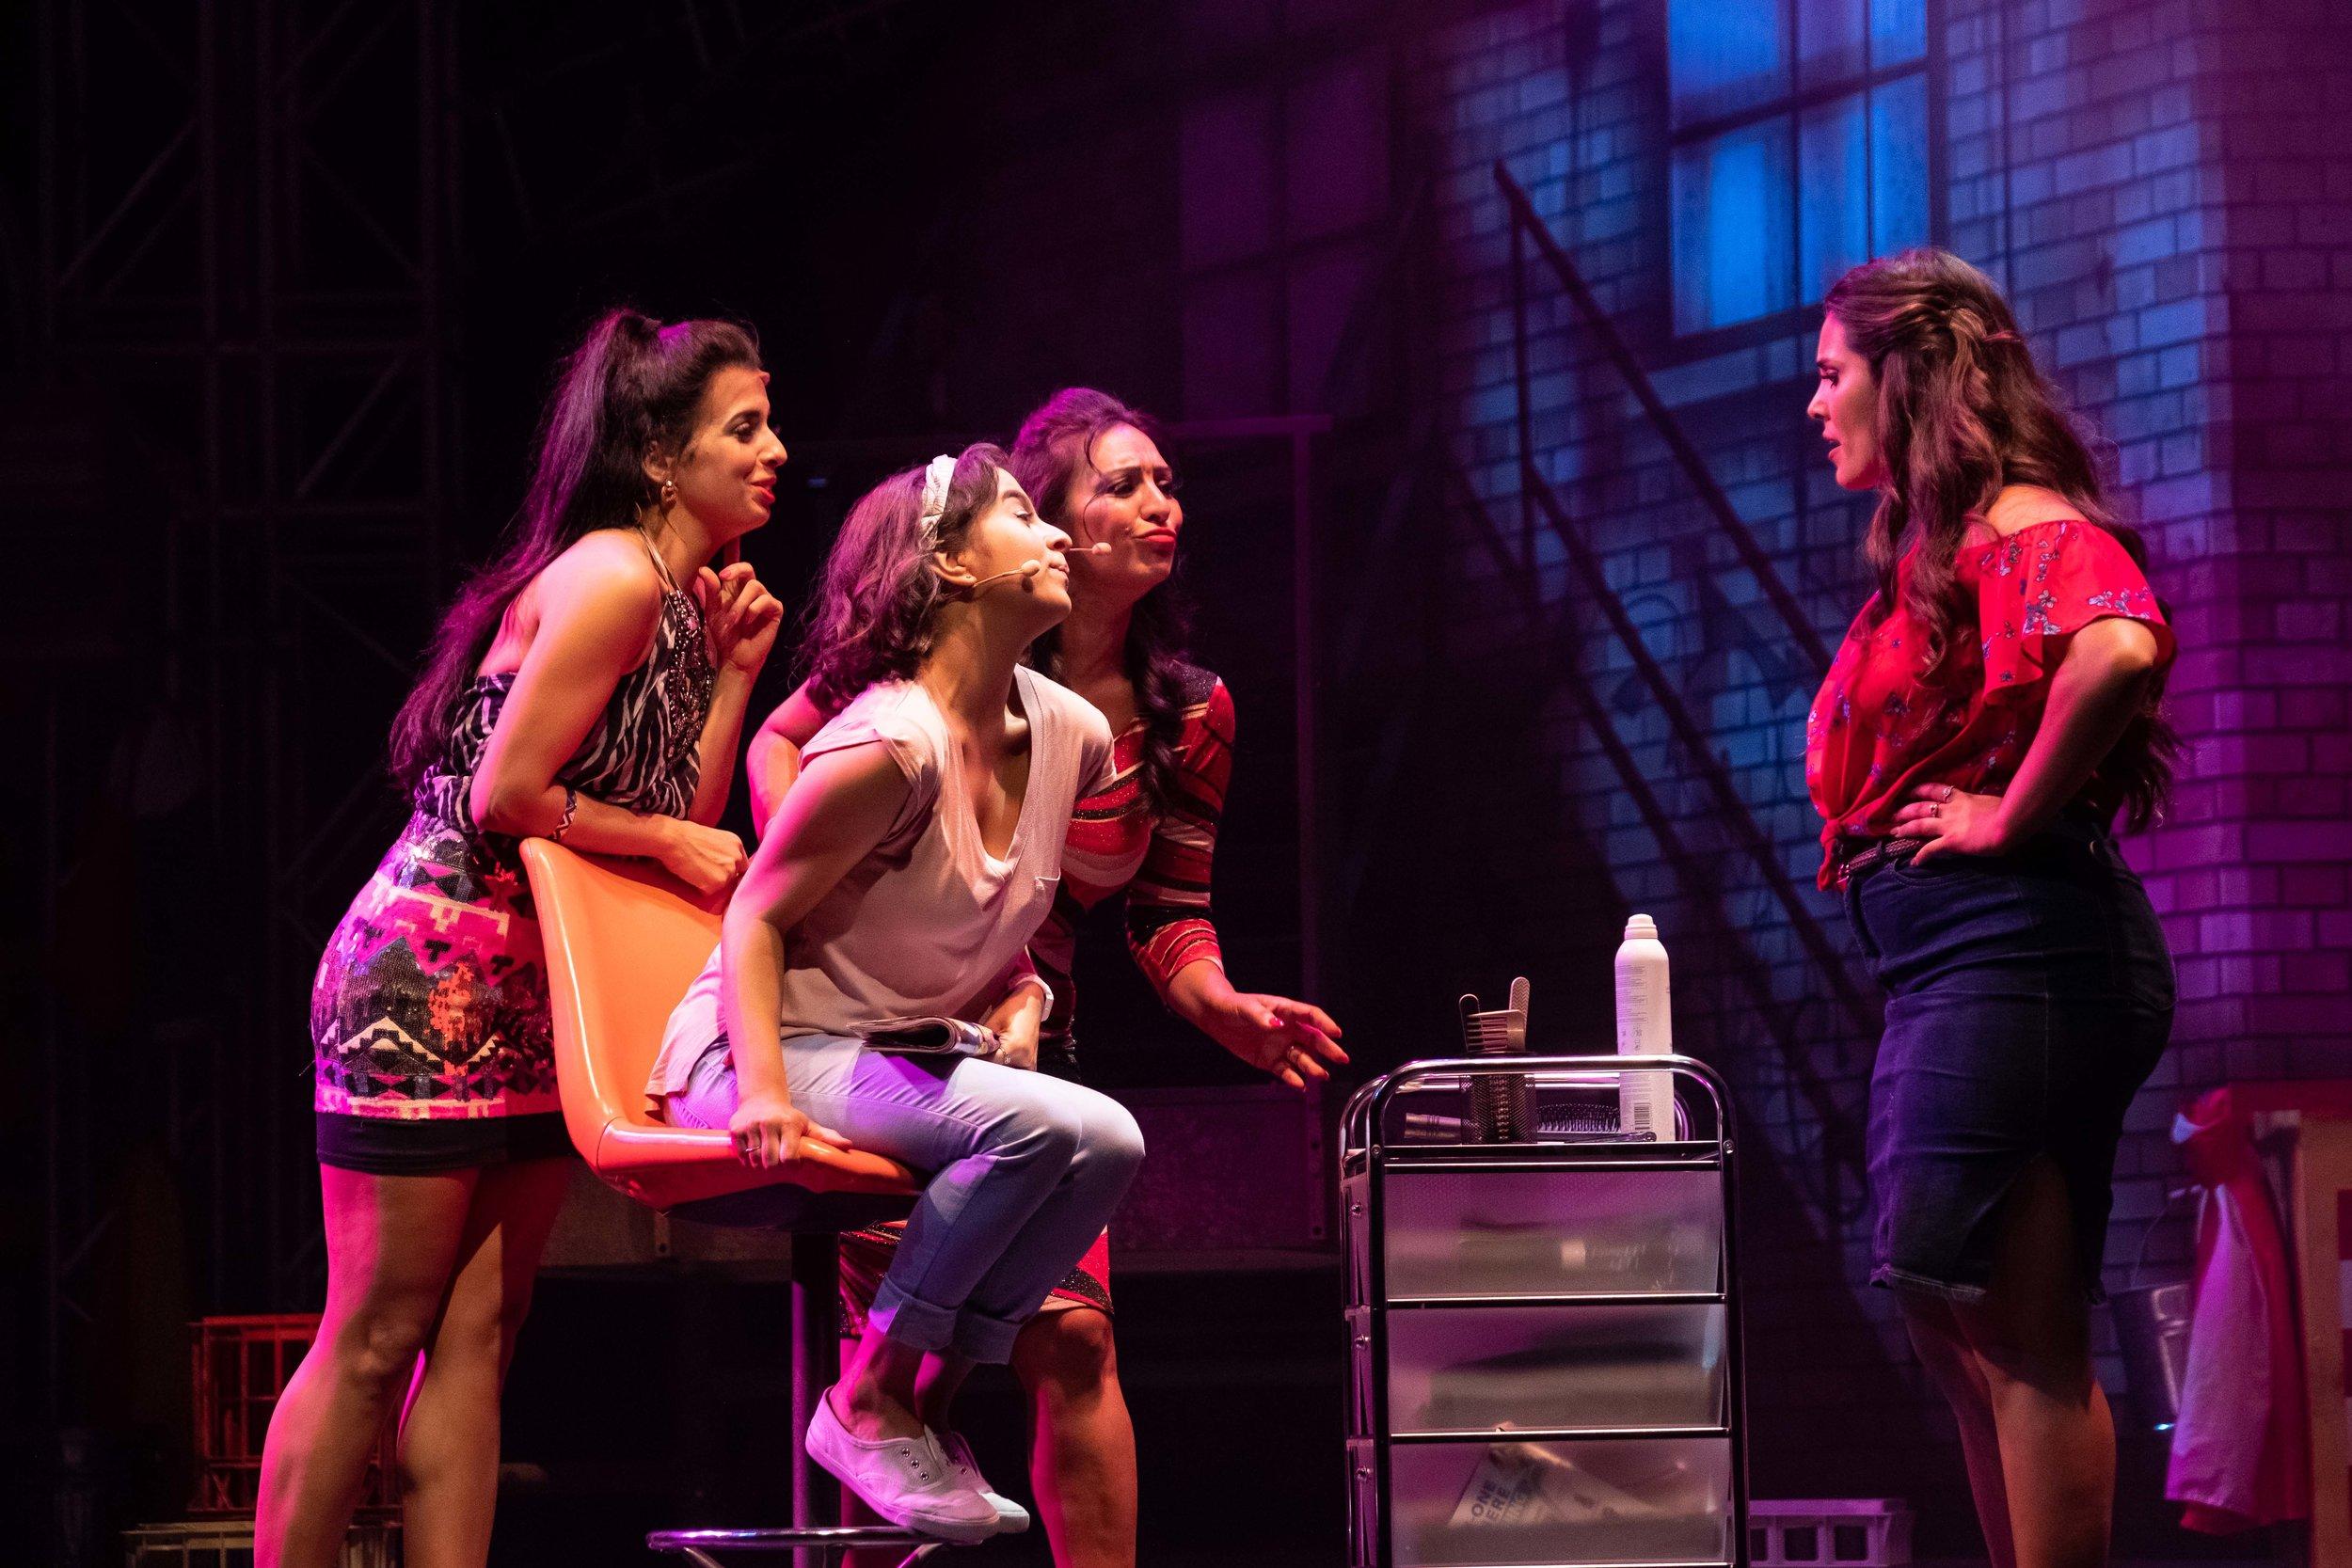 Libby Asciak, Luisa Scrofani, Monique Montez, Olivia Vasquez InTheHeights_SOH_clarehawley-9.jpg